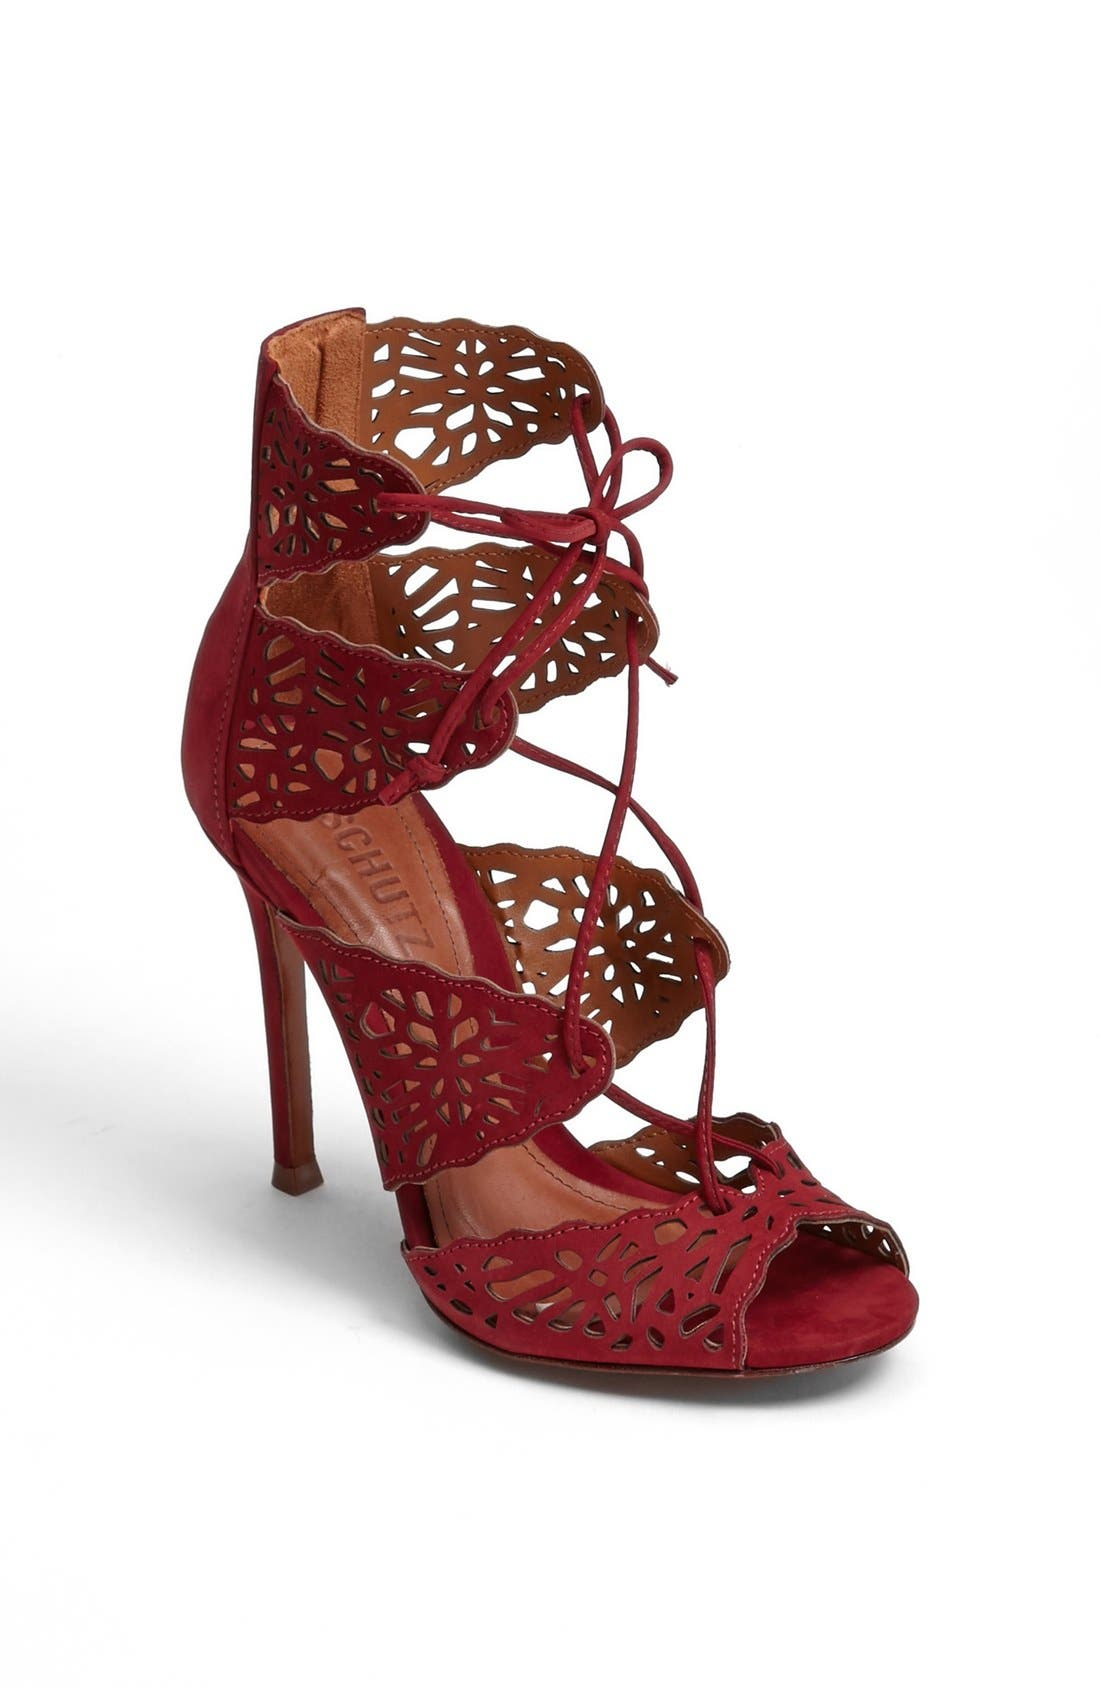 Alternate Image 1 Selected - Schutz 'Ciara' Perforated Sandal